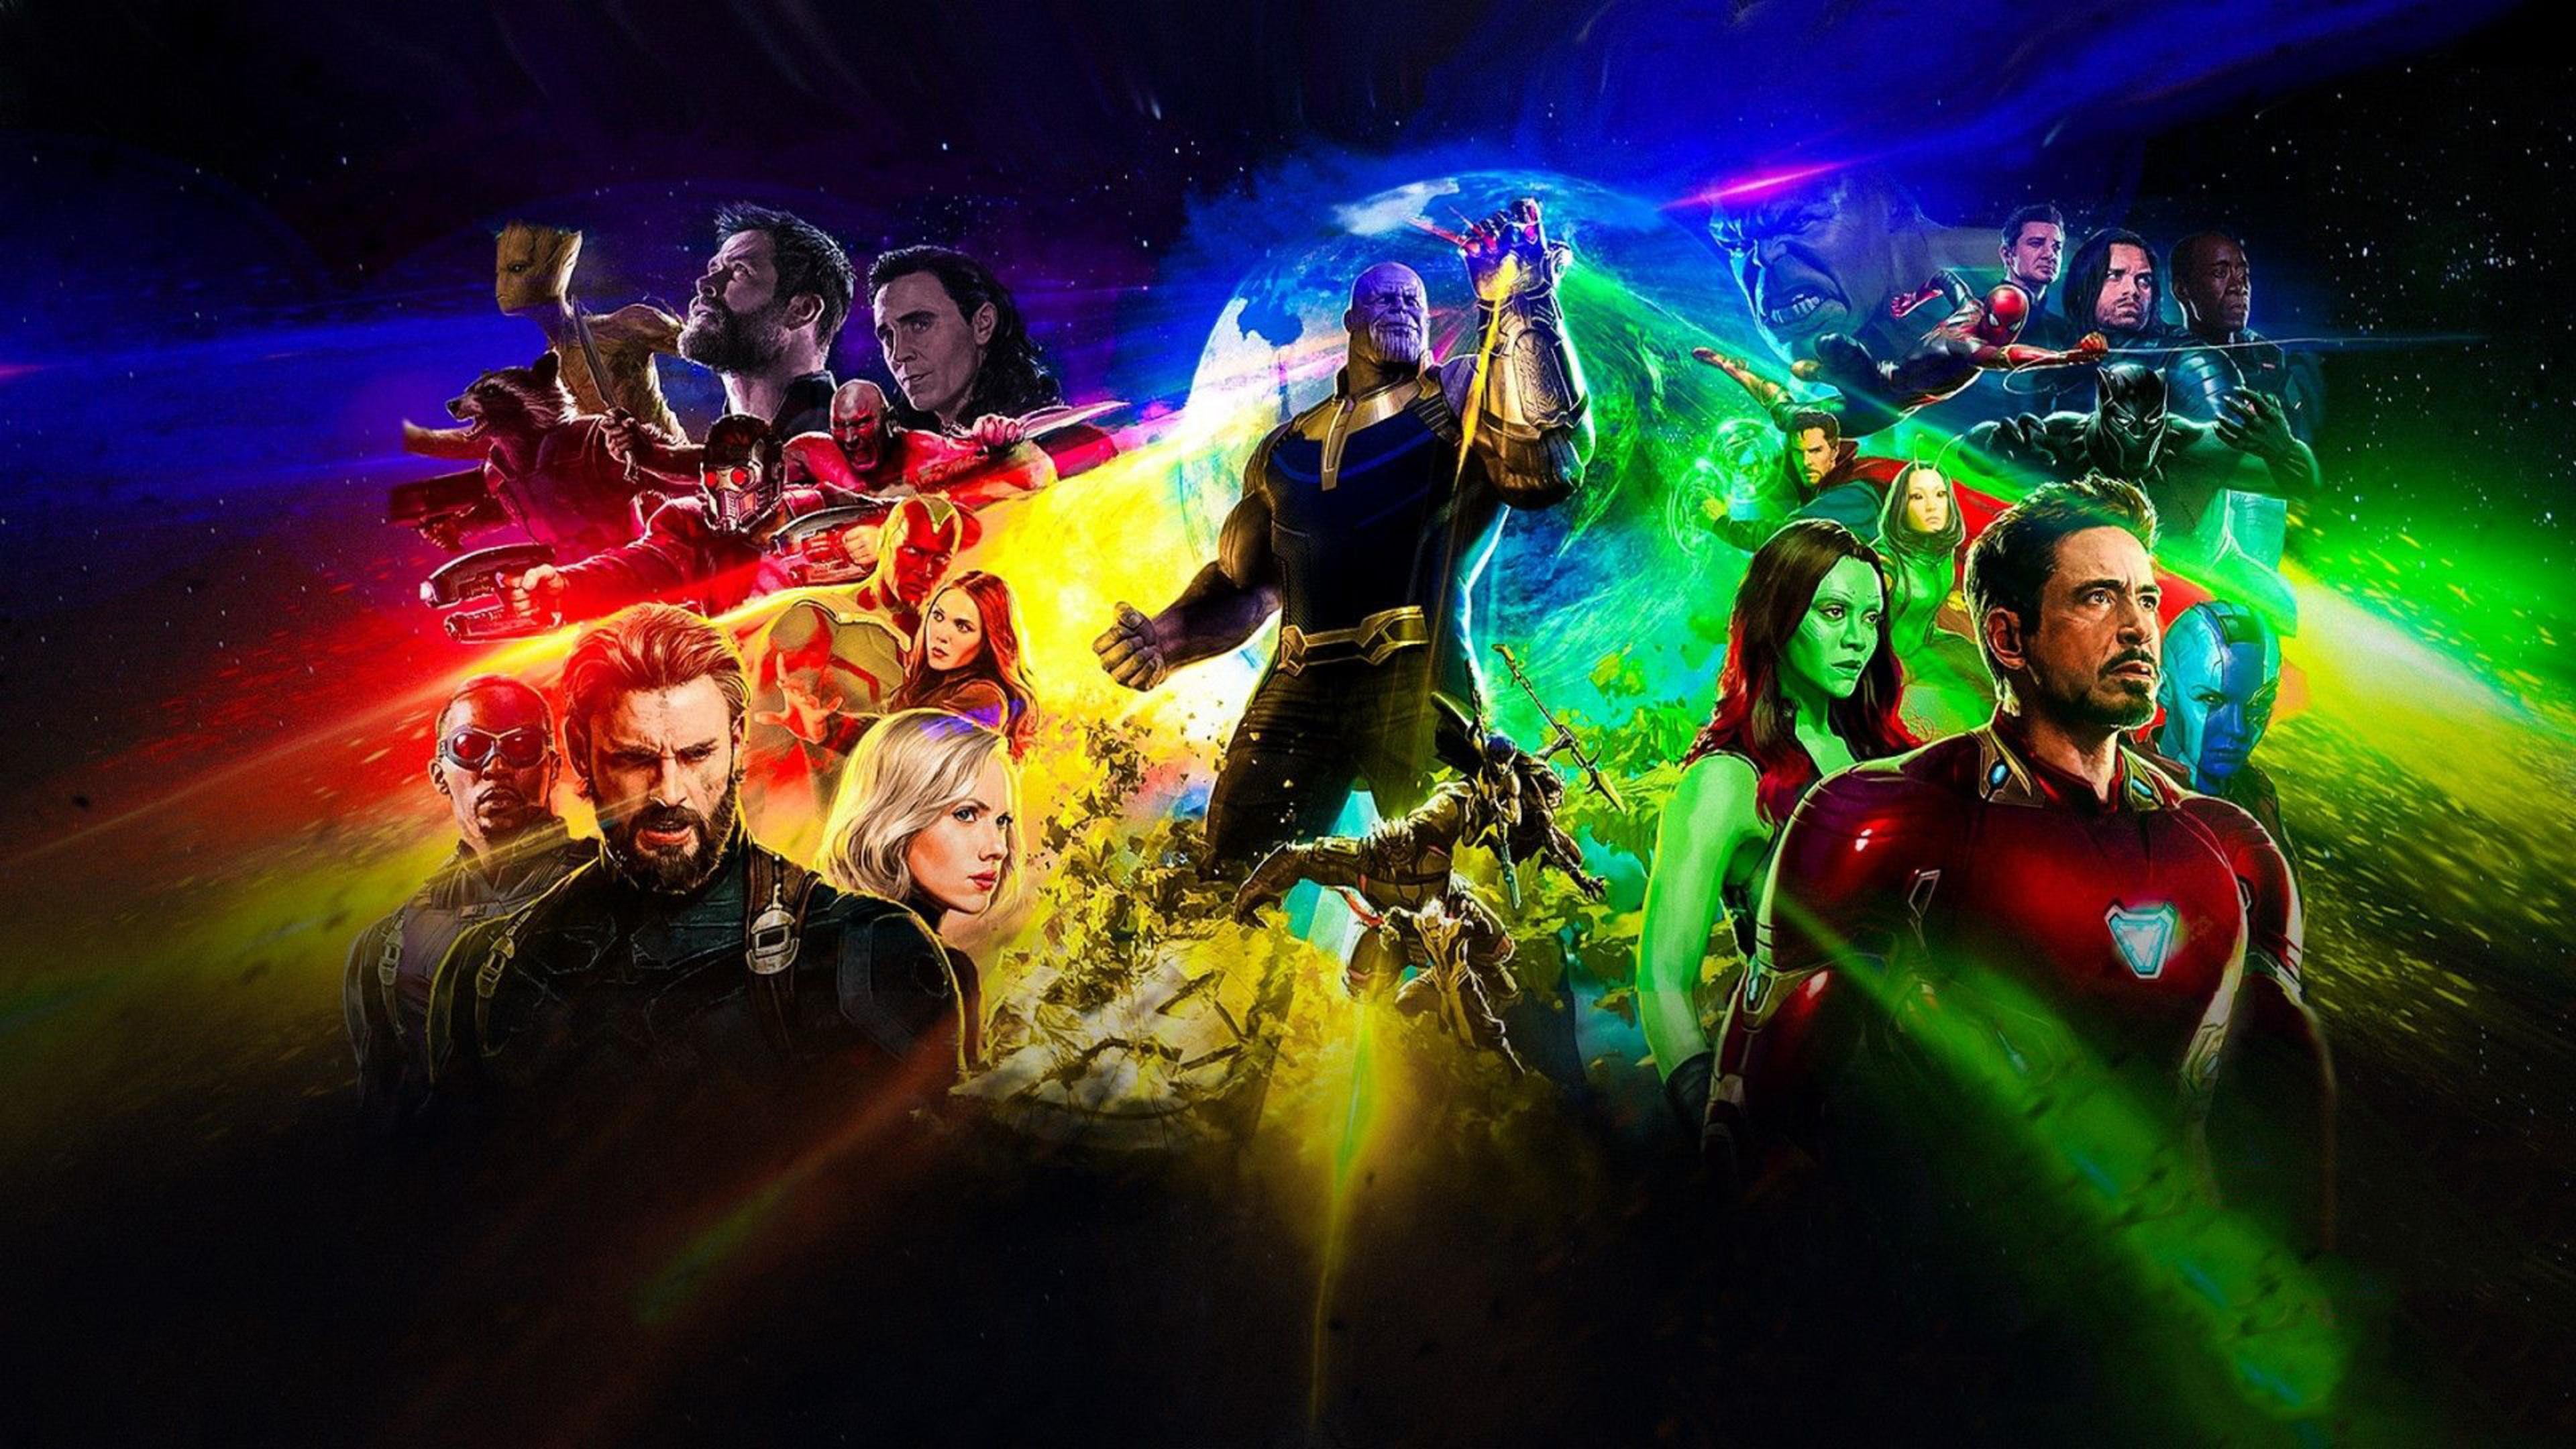 3840x2160 avengers infinity war new poster 4k hd 4k